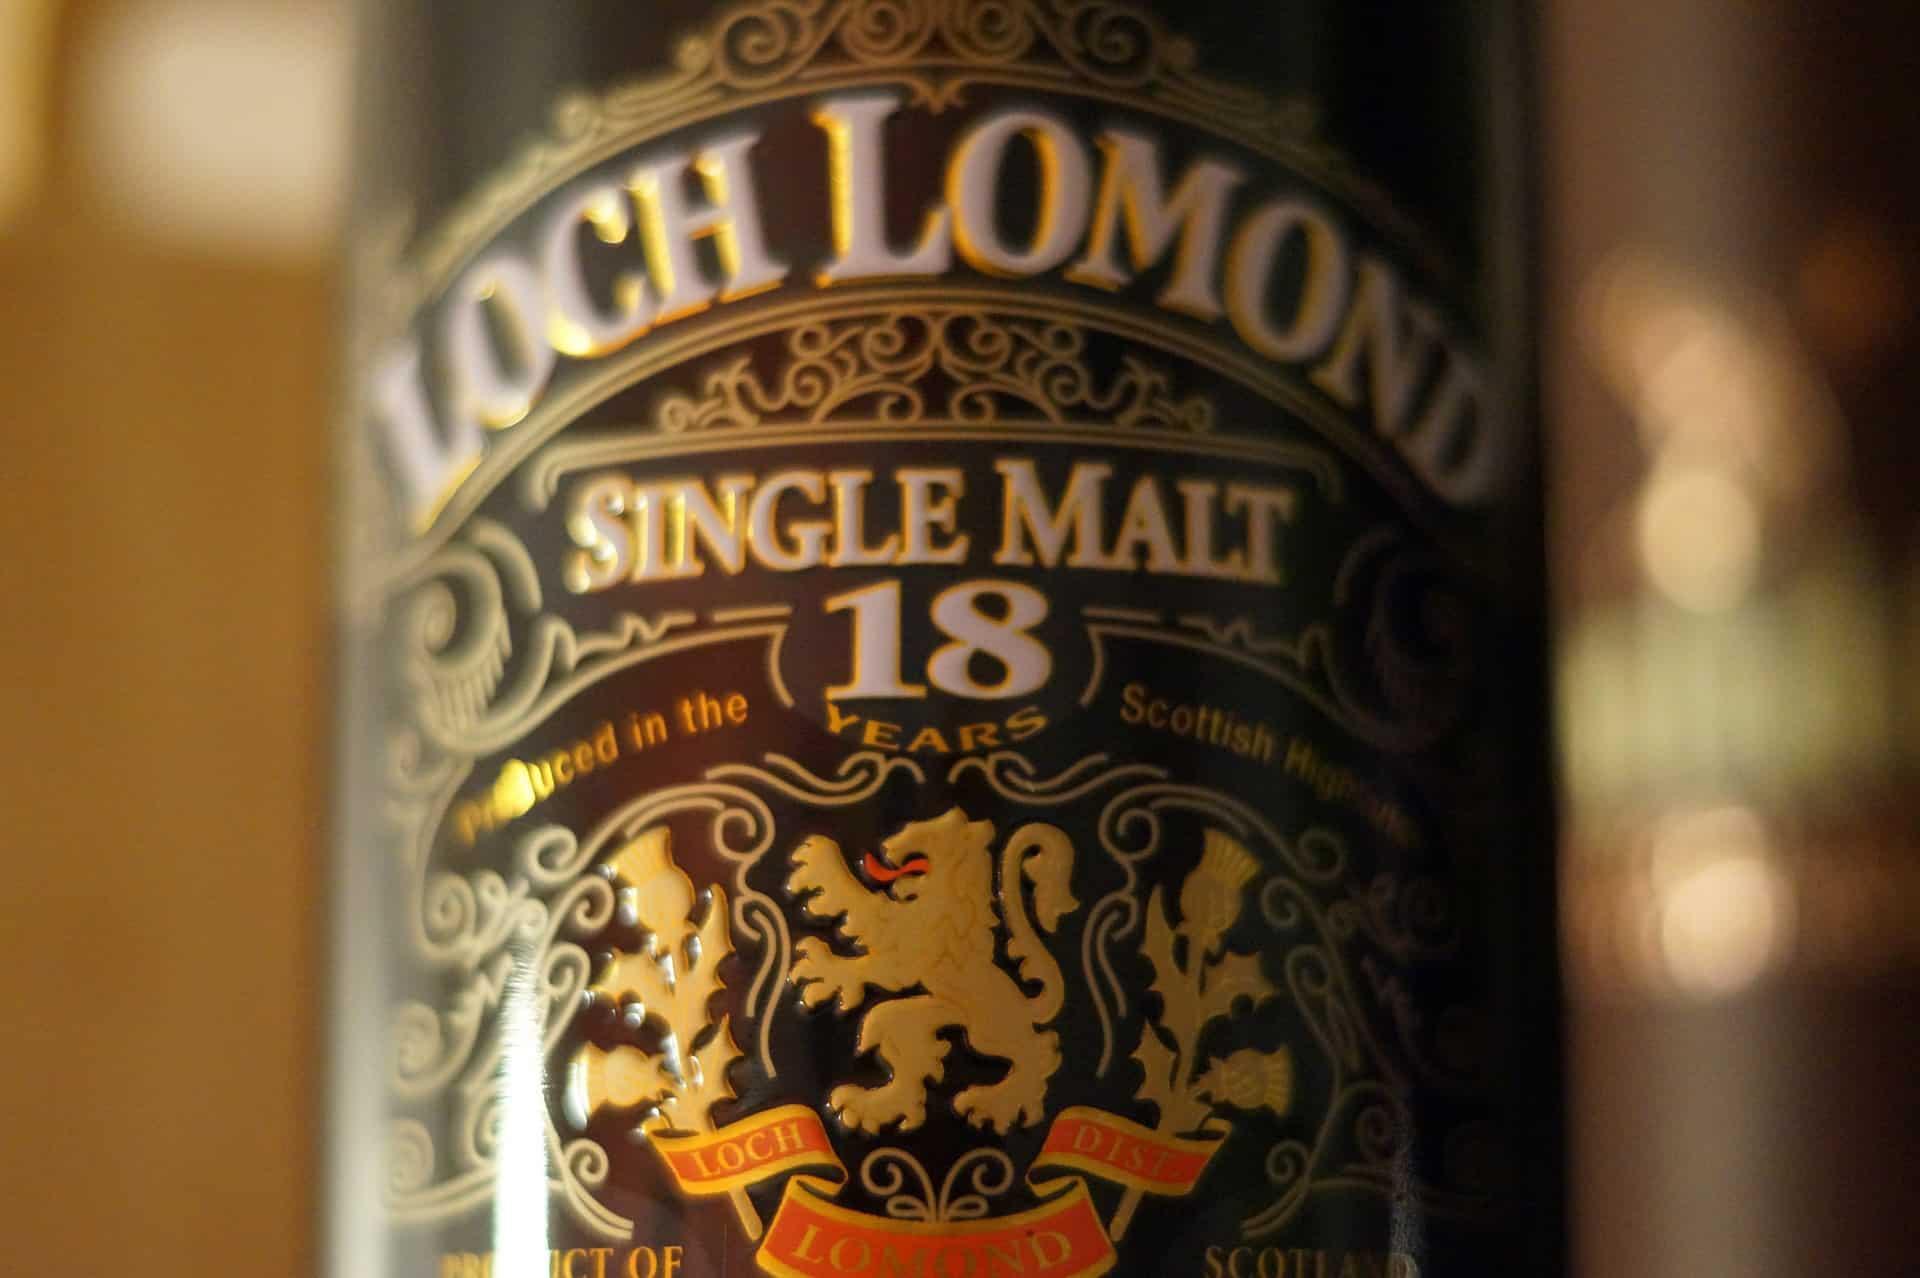 etykieta na butelce whisky z regionu Highlands